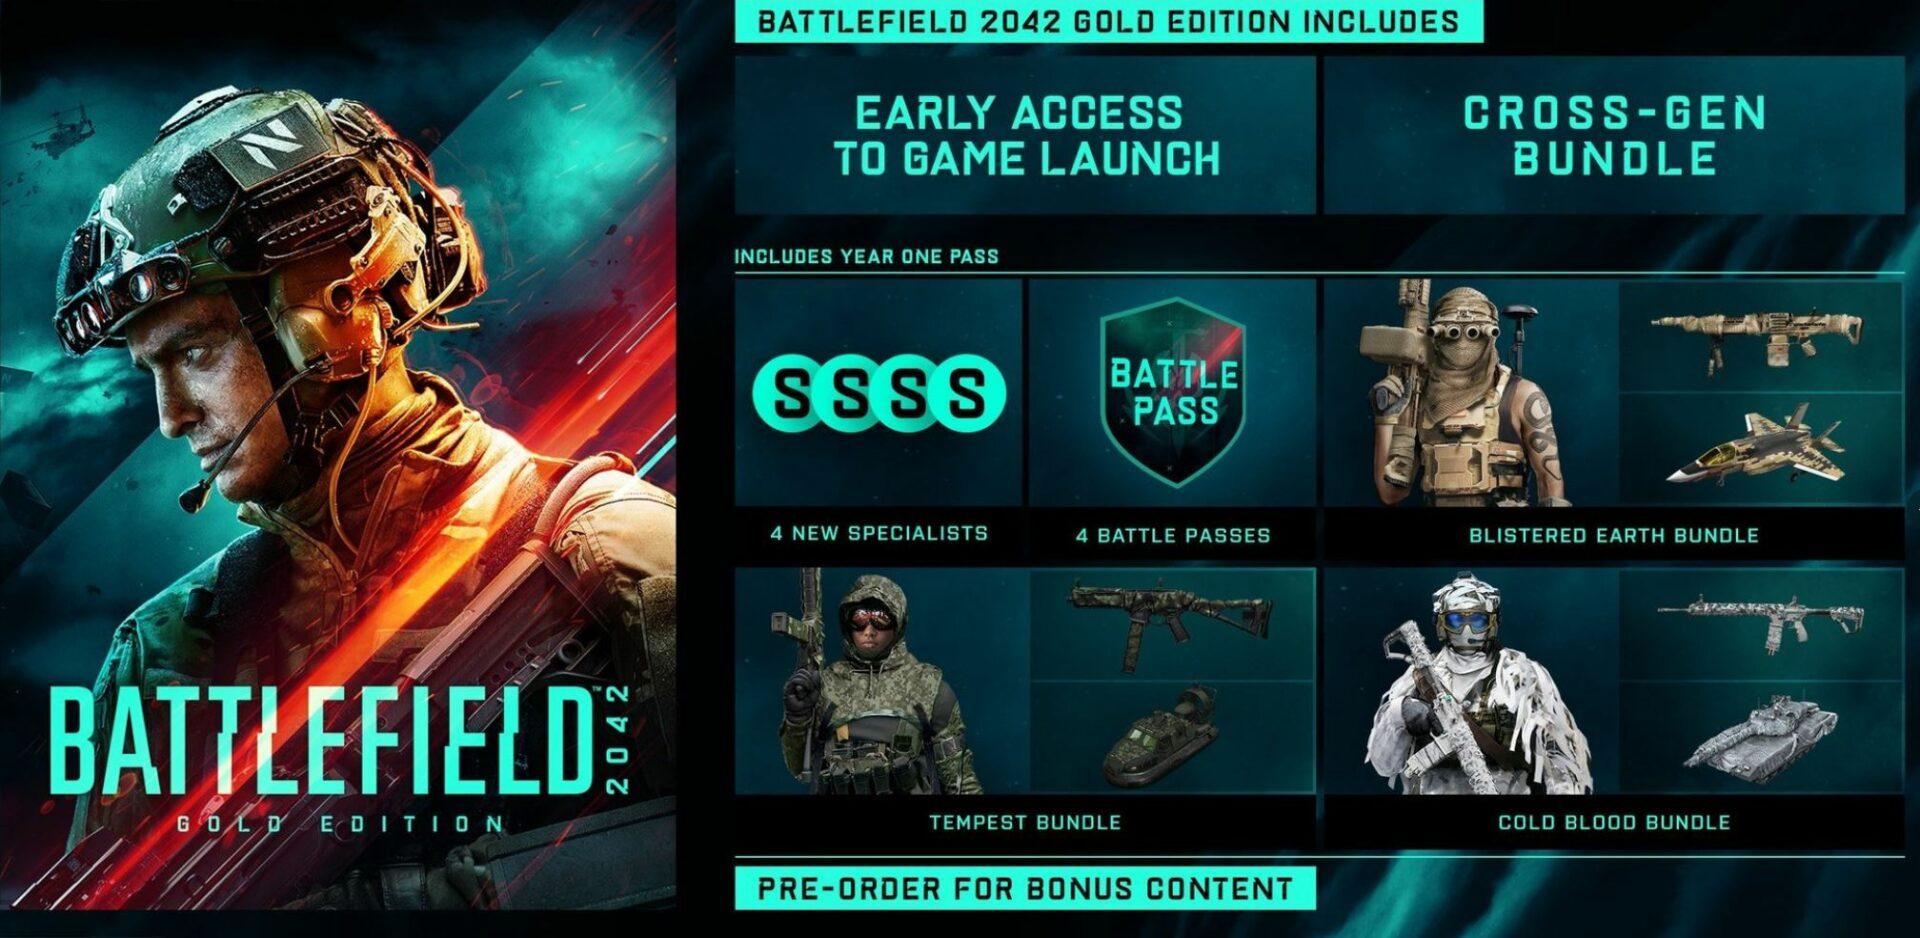 battlefield-2042-gold-edition-pre